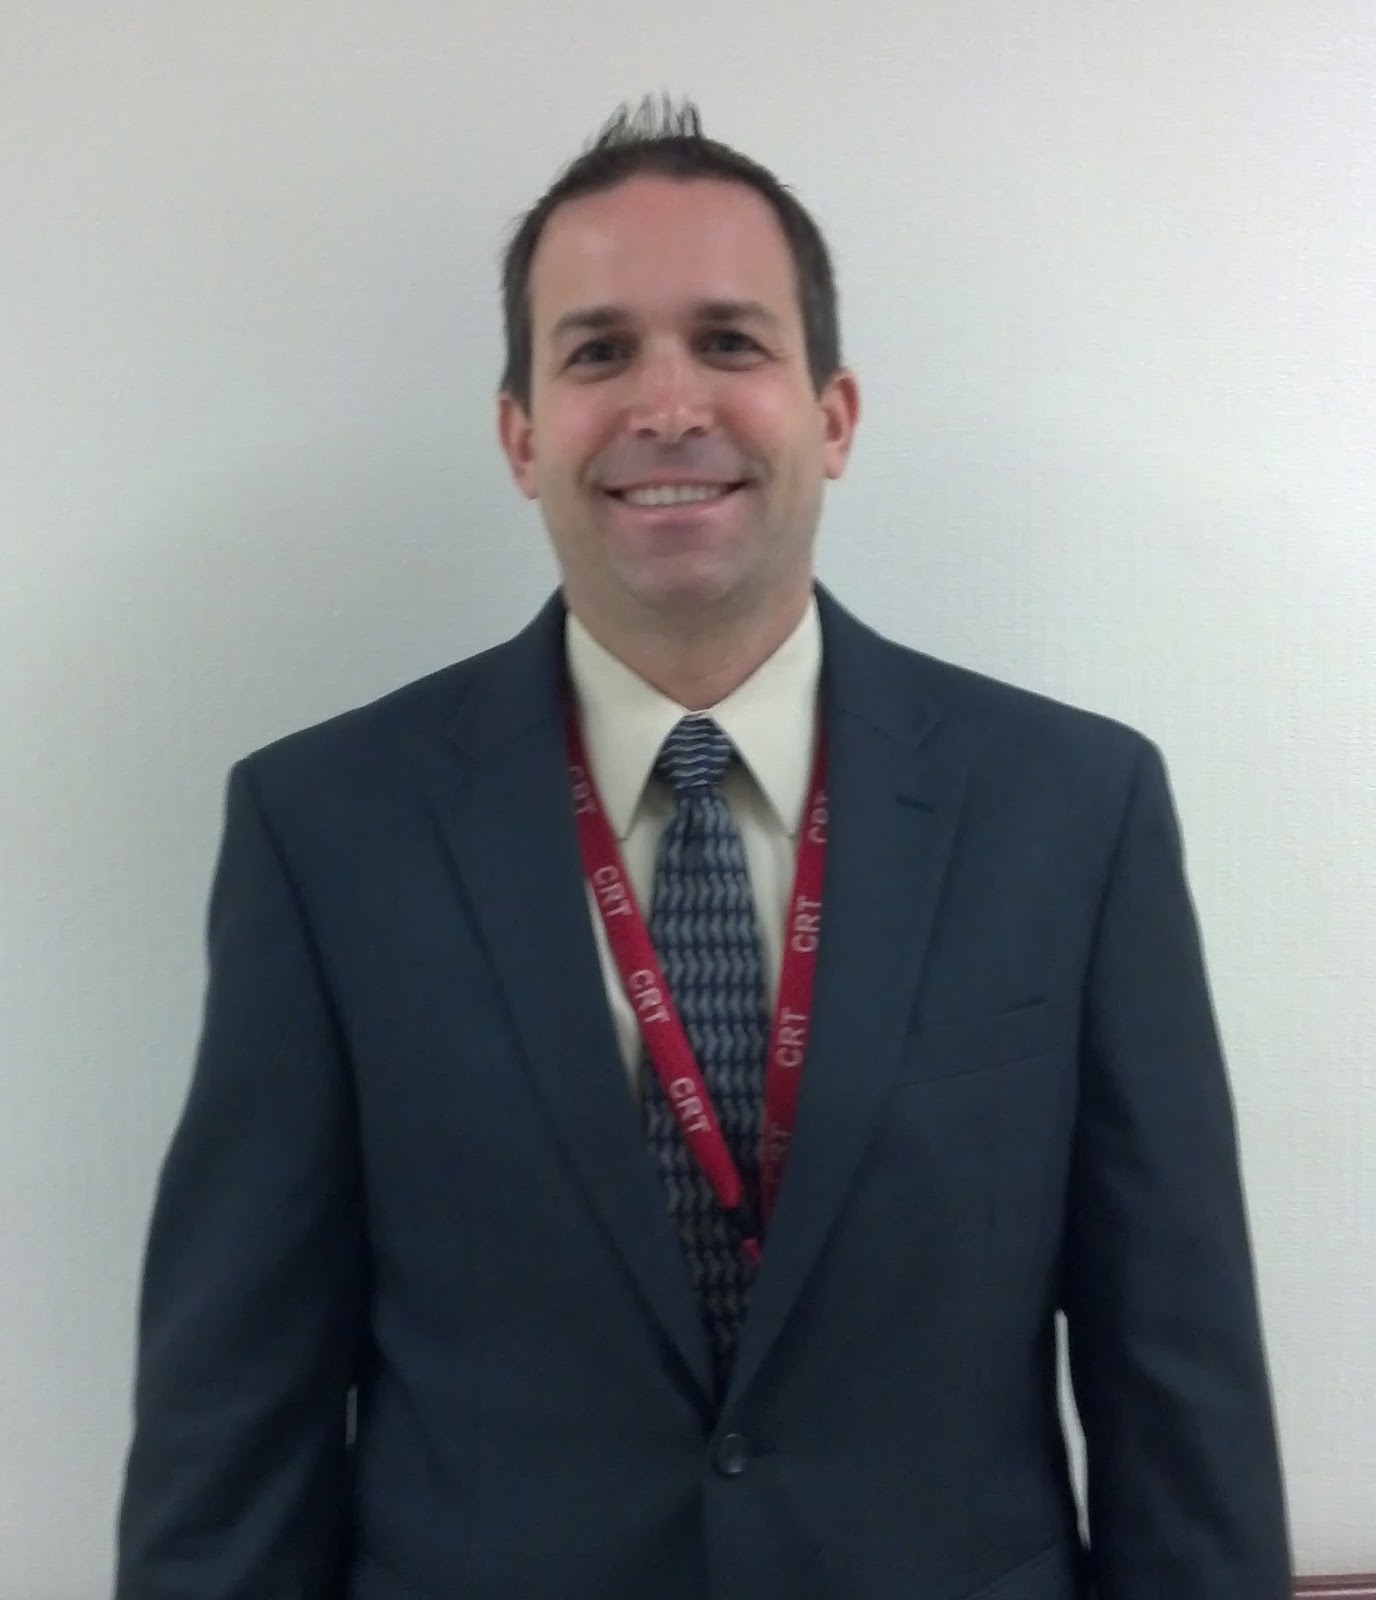 Dennis Ferraro student services